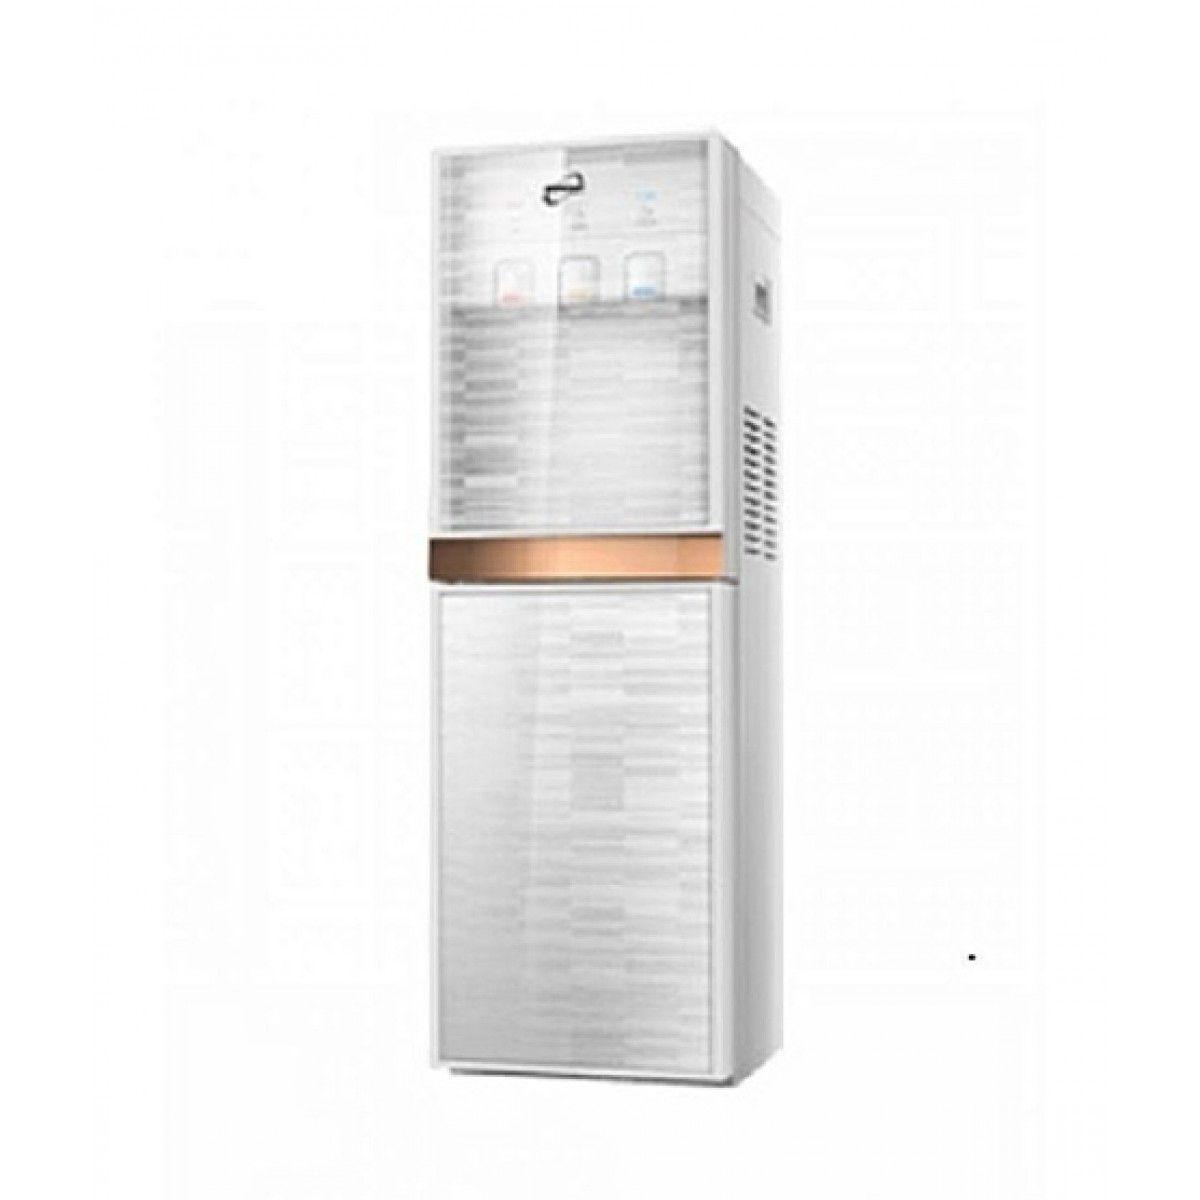 Homage 3 Taps HWD-62 Water Dispenser